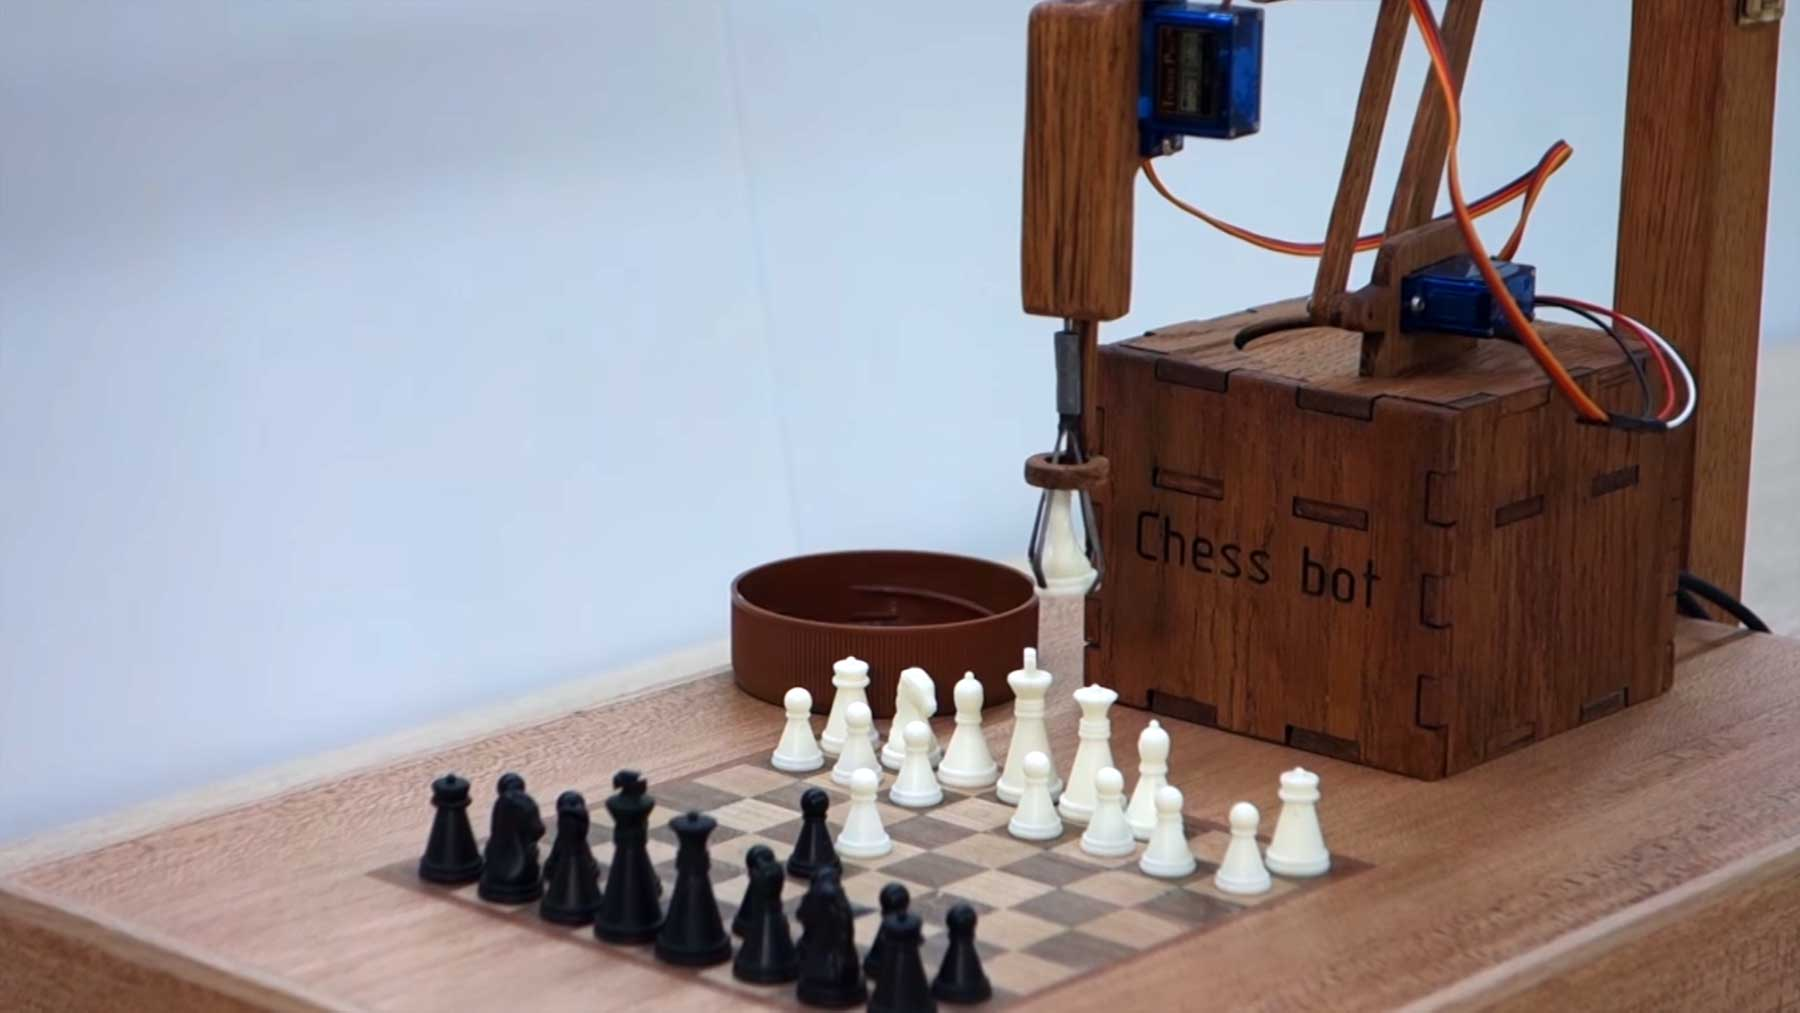 Physisch spielender Schach-Roboter